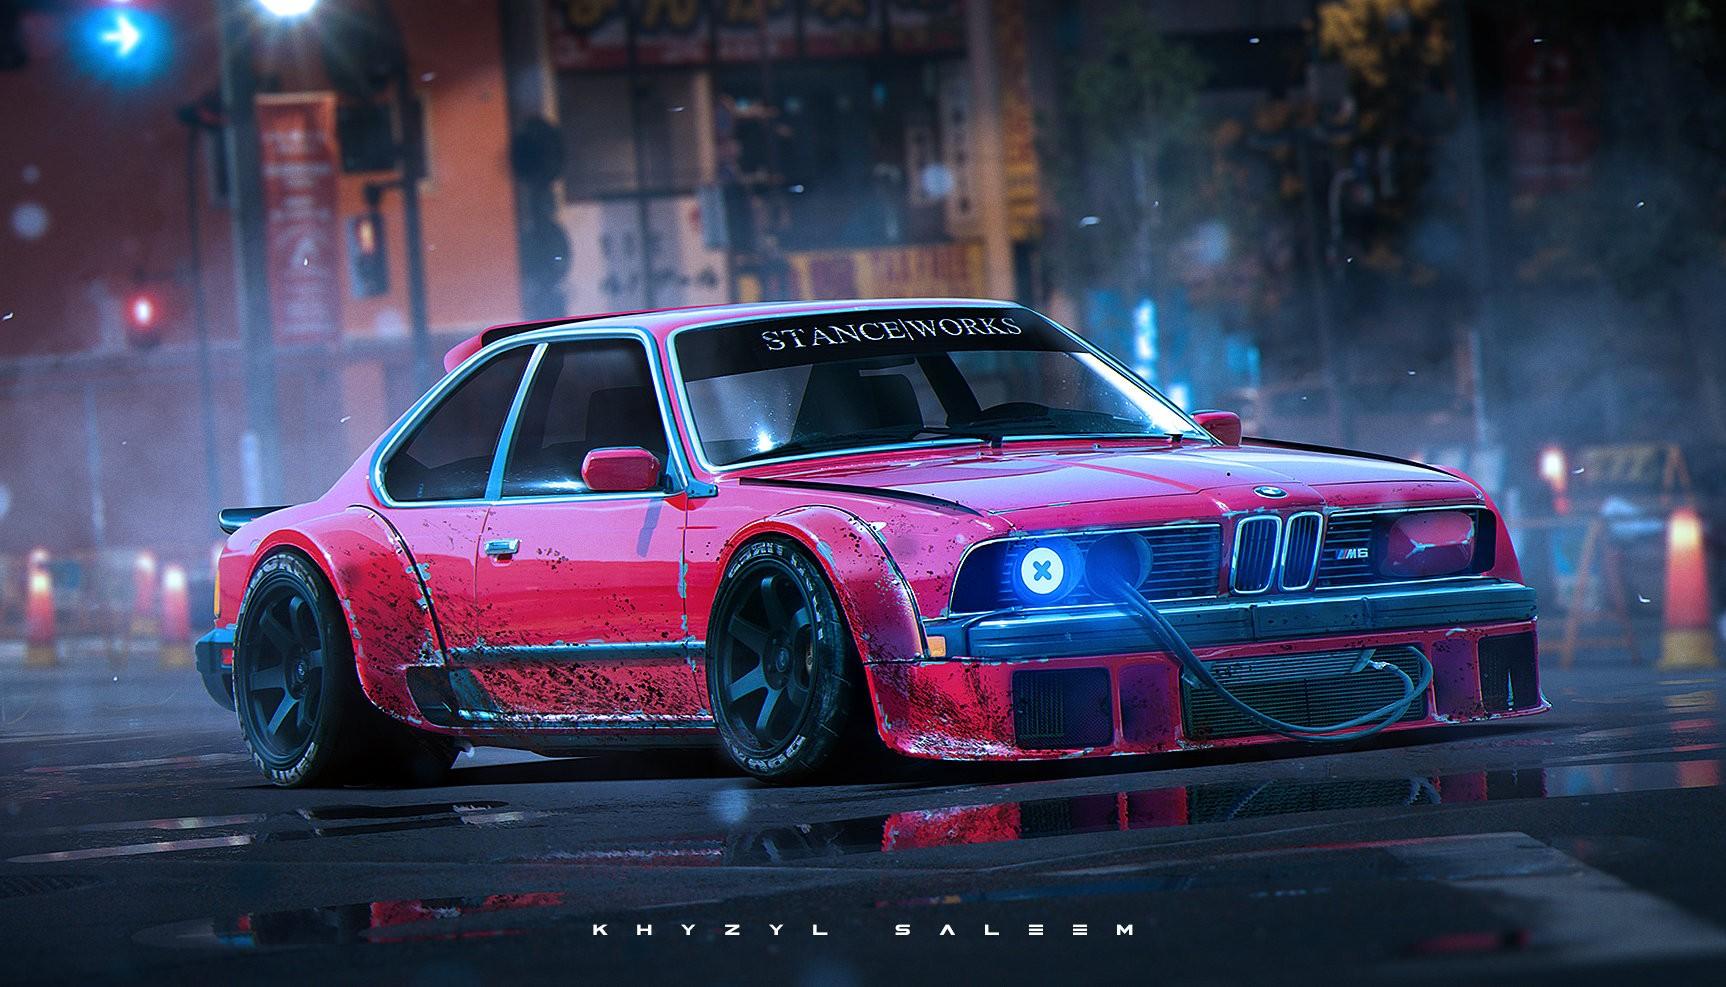 wallpaper render artwork sports car stanceworks khyzyl saleem